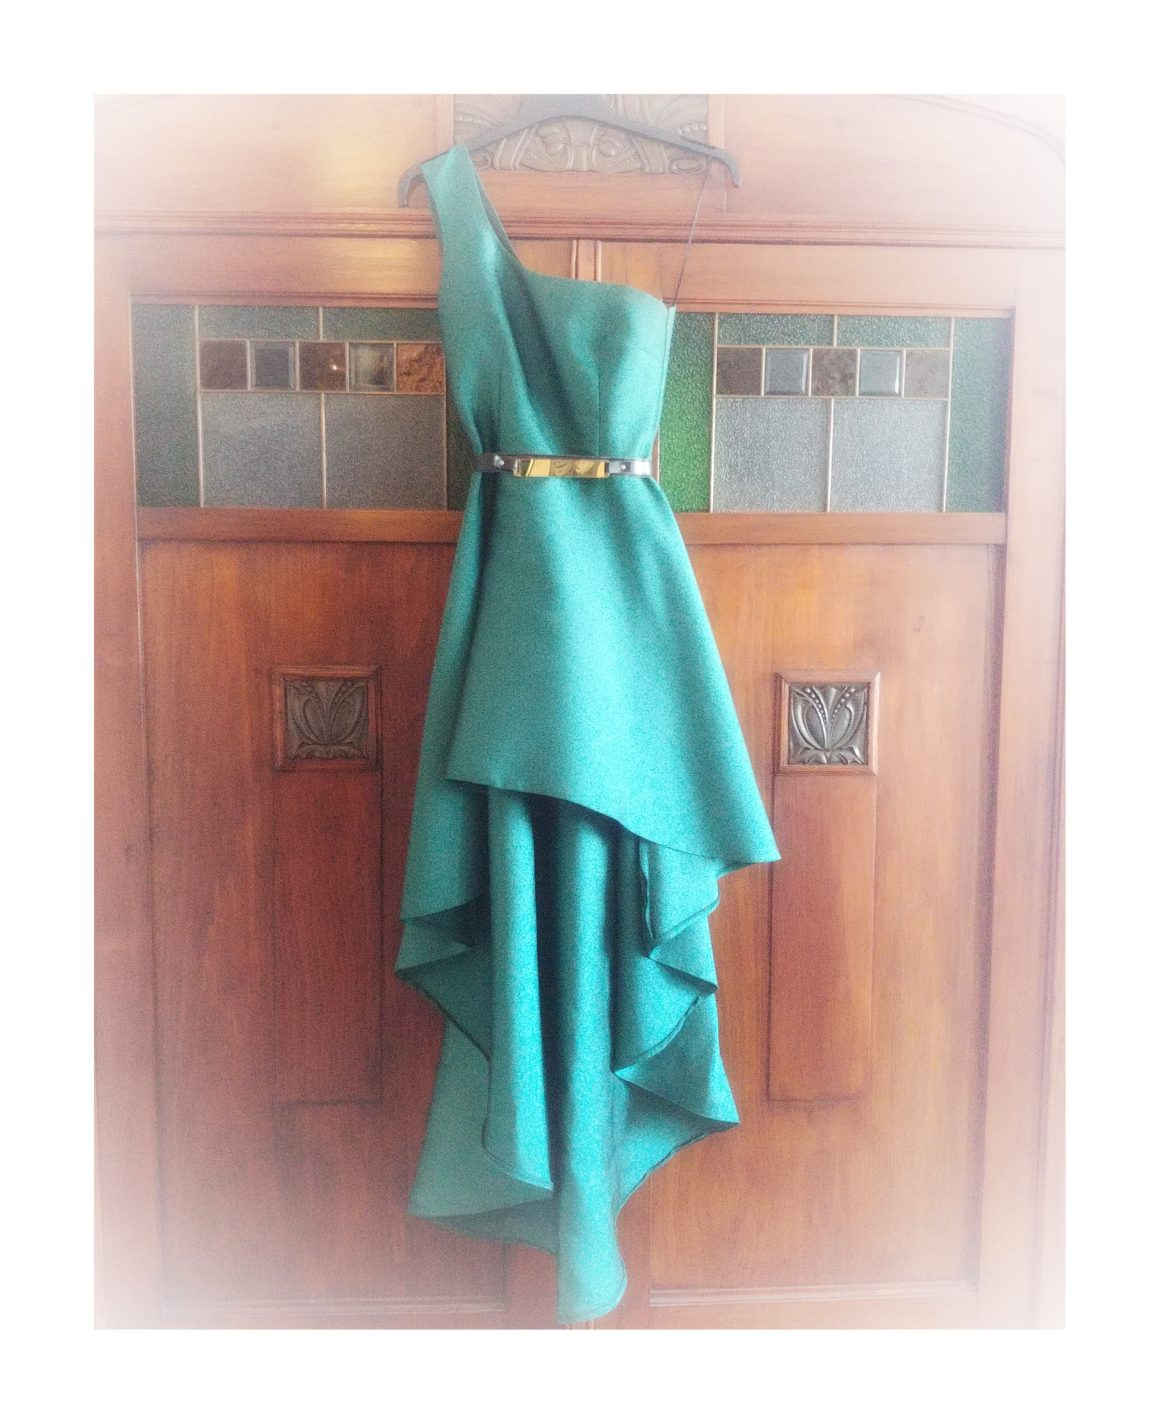 Tania sukienka na wesele